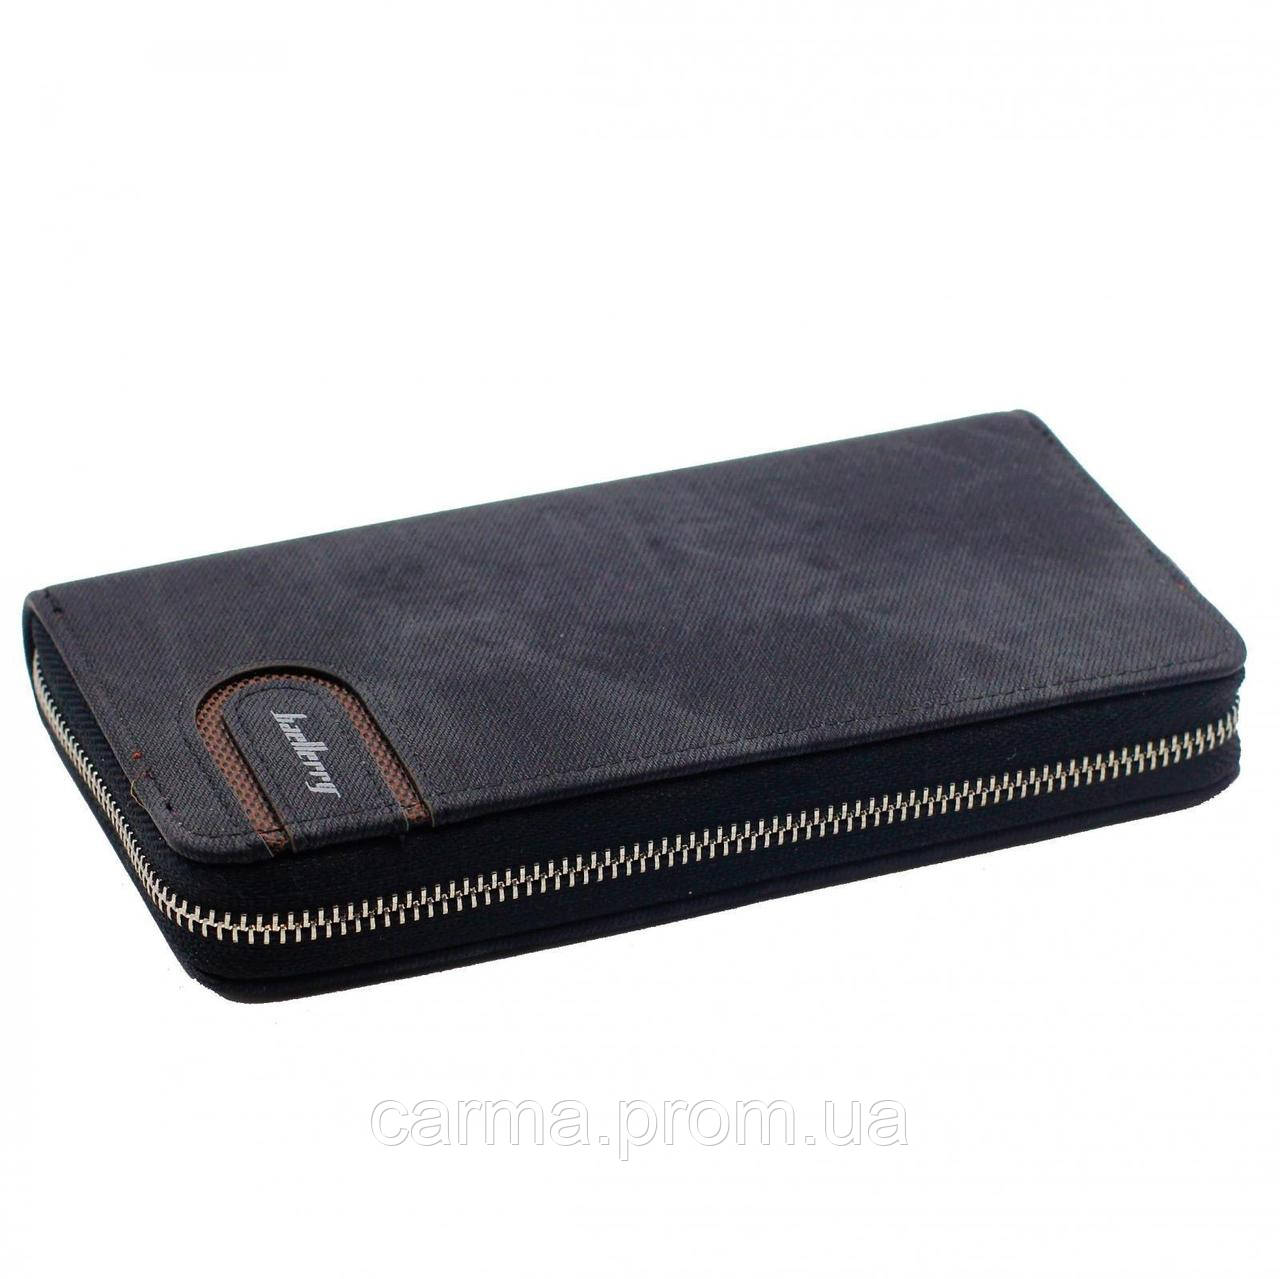 Мужское портмоне Baellerry Denim S1514 Black